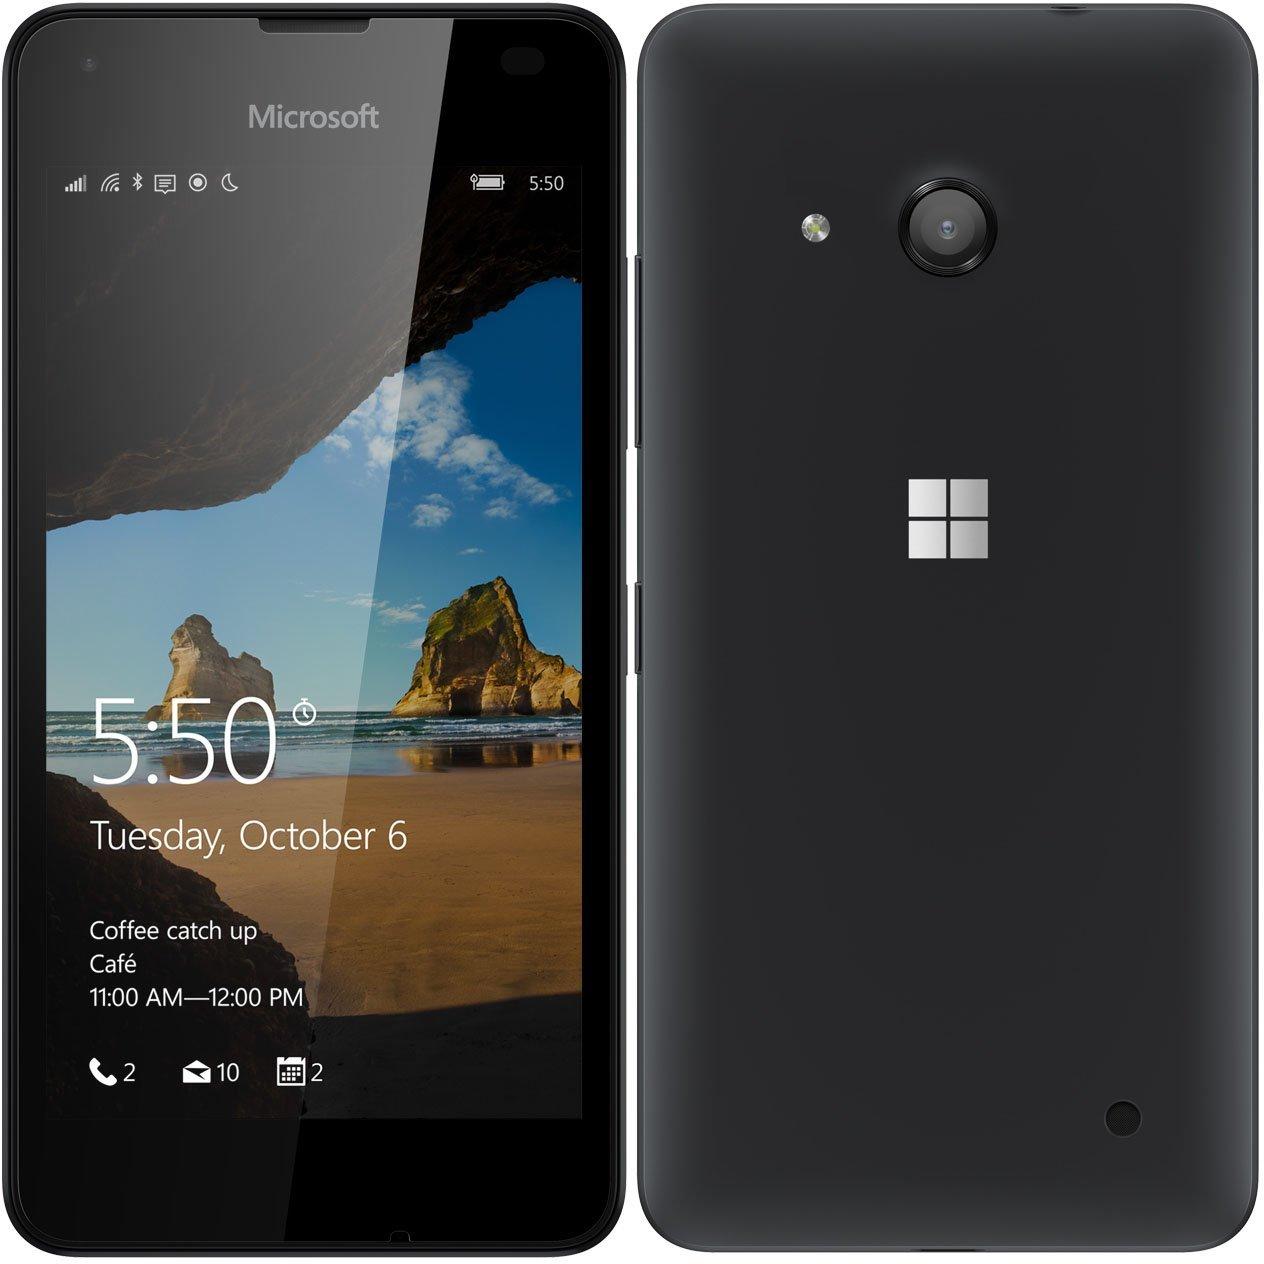 Microsoft Lumia 550 RM-1127 8GB Factory Unlocked 4G/LTE - International Version No Warranty (Black) (Certified Refurbished)